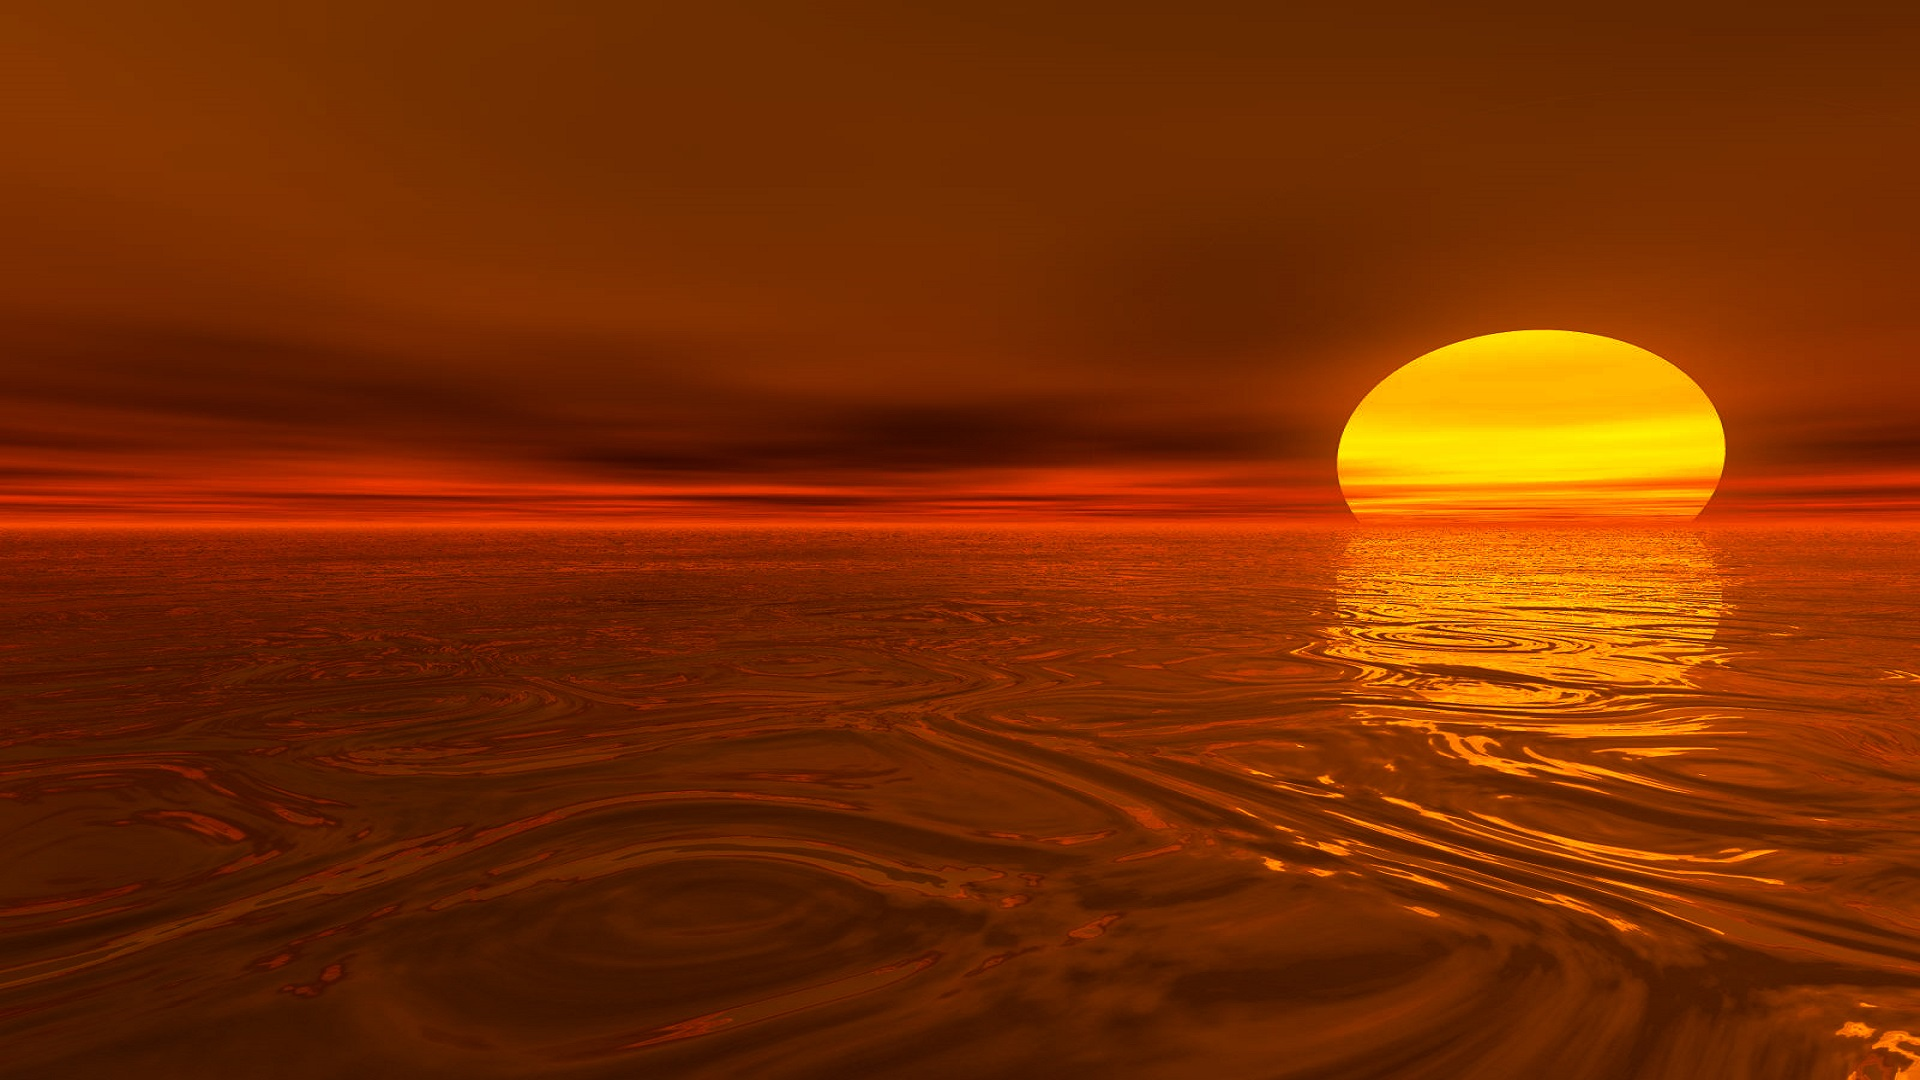 sunrise-hd-free-wallpapers-for-desktop-download - hd wallpaper